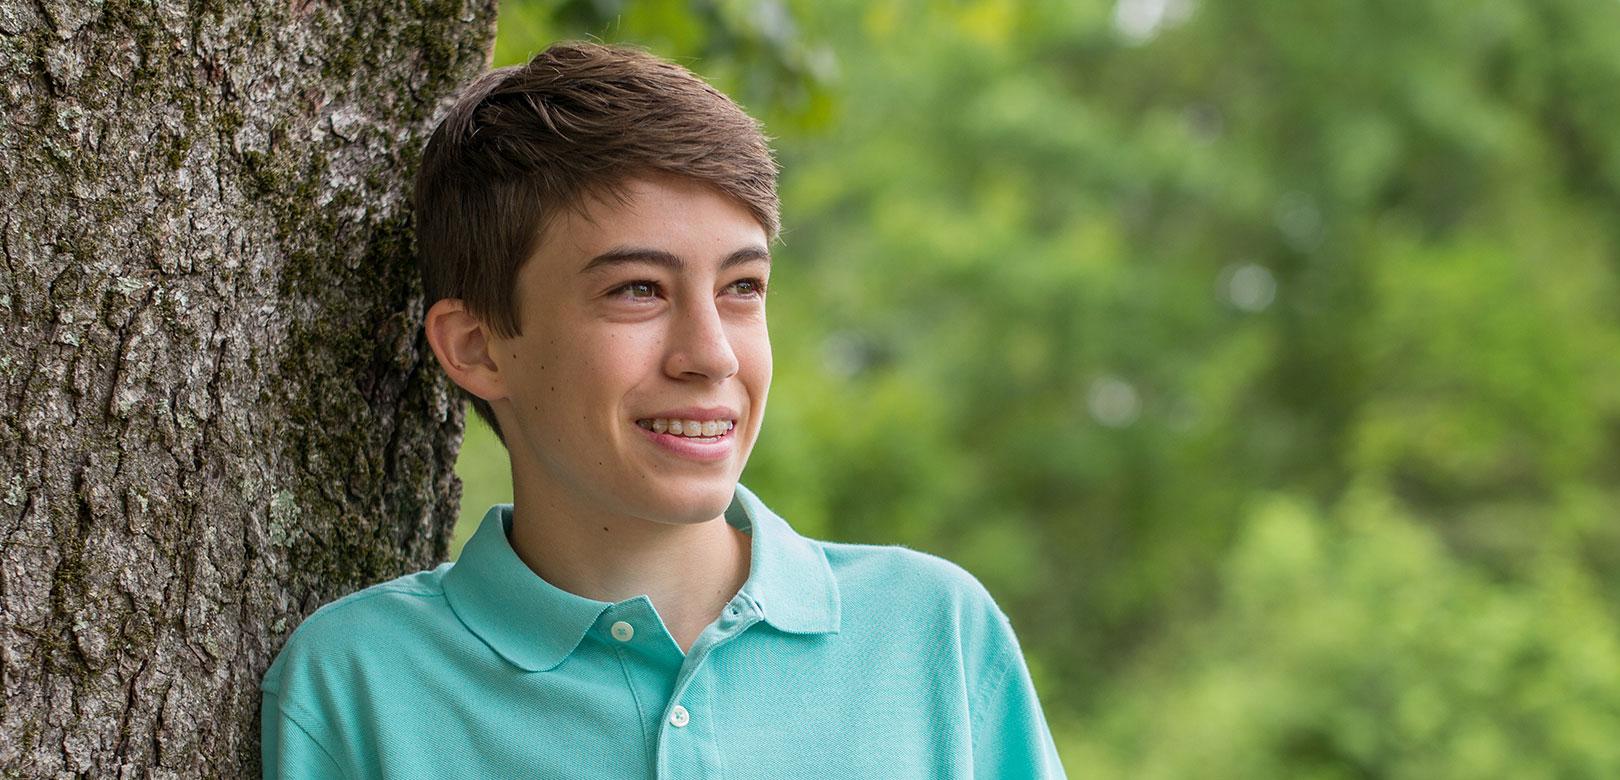 Fabulous Smiles Orthodontics Treatment Teen Adolescent Braces Smiling